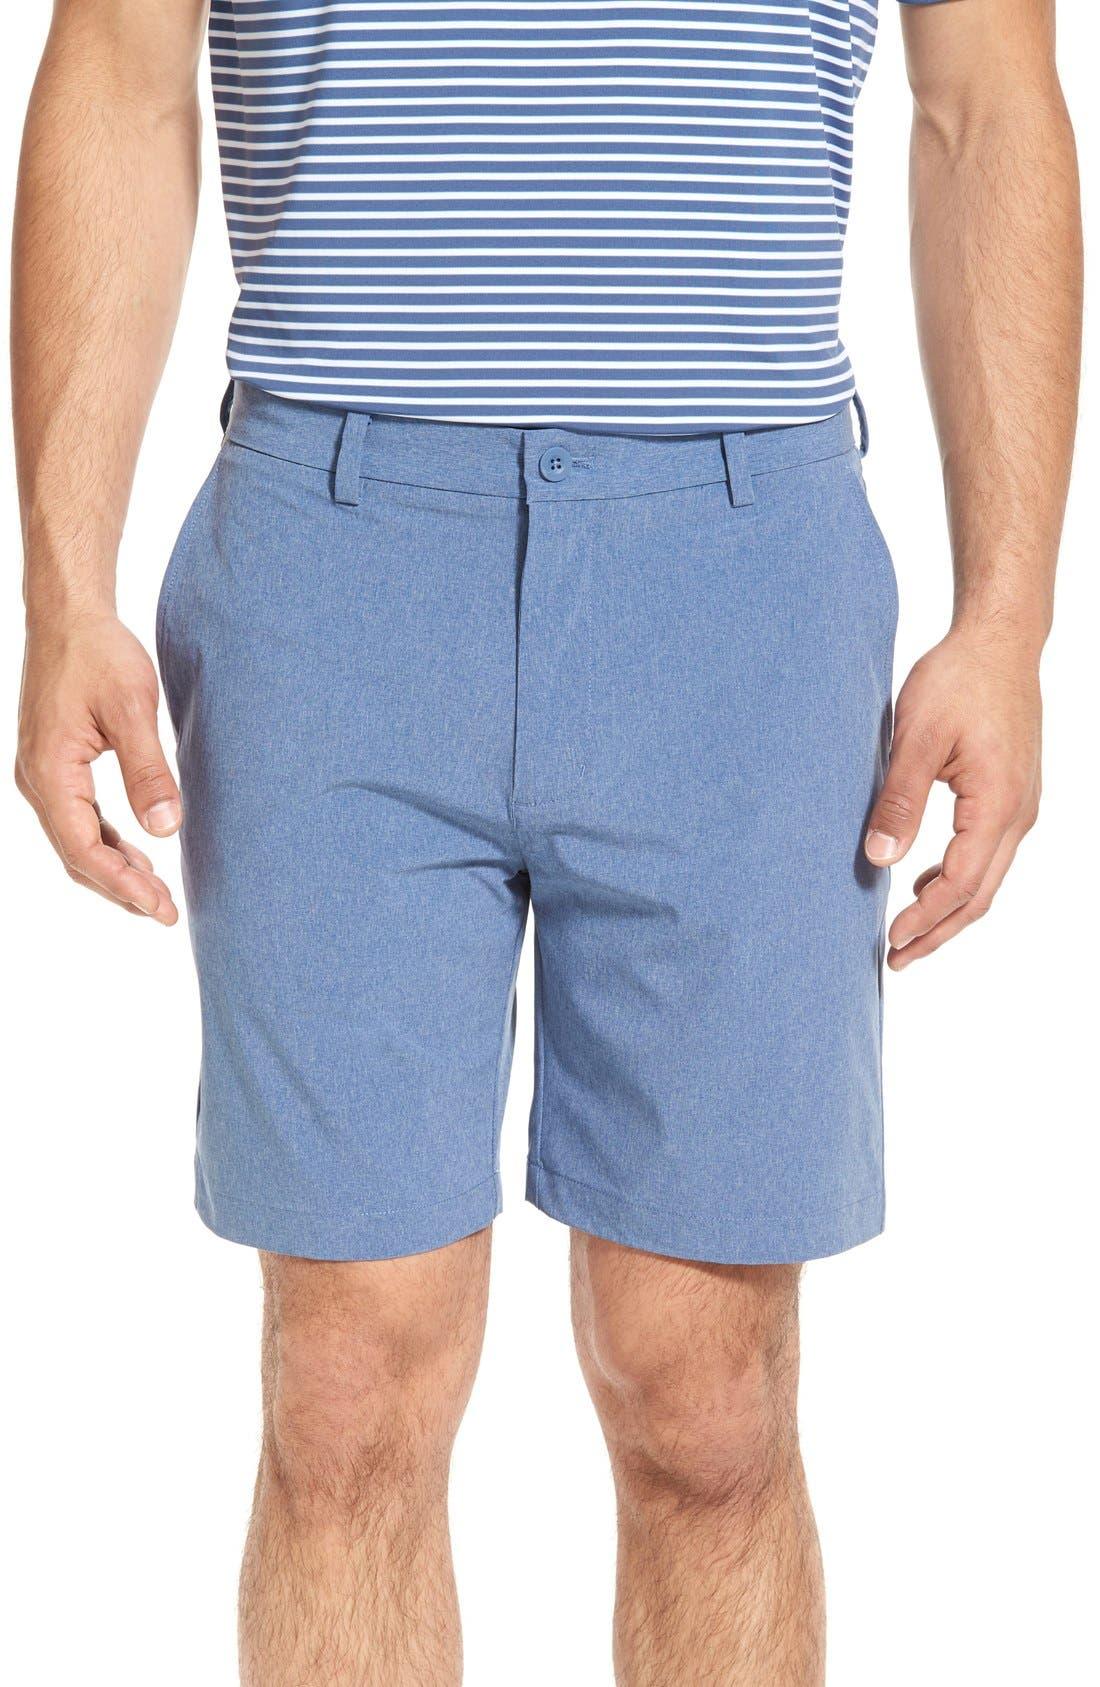 8 Inch Performance Breaker Shorts,                             Main thumbnail 10, color,